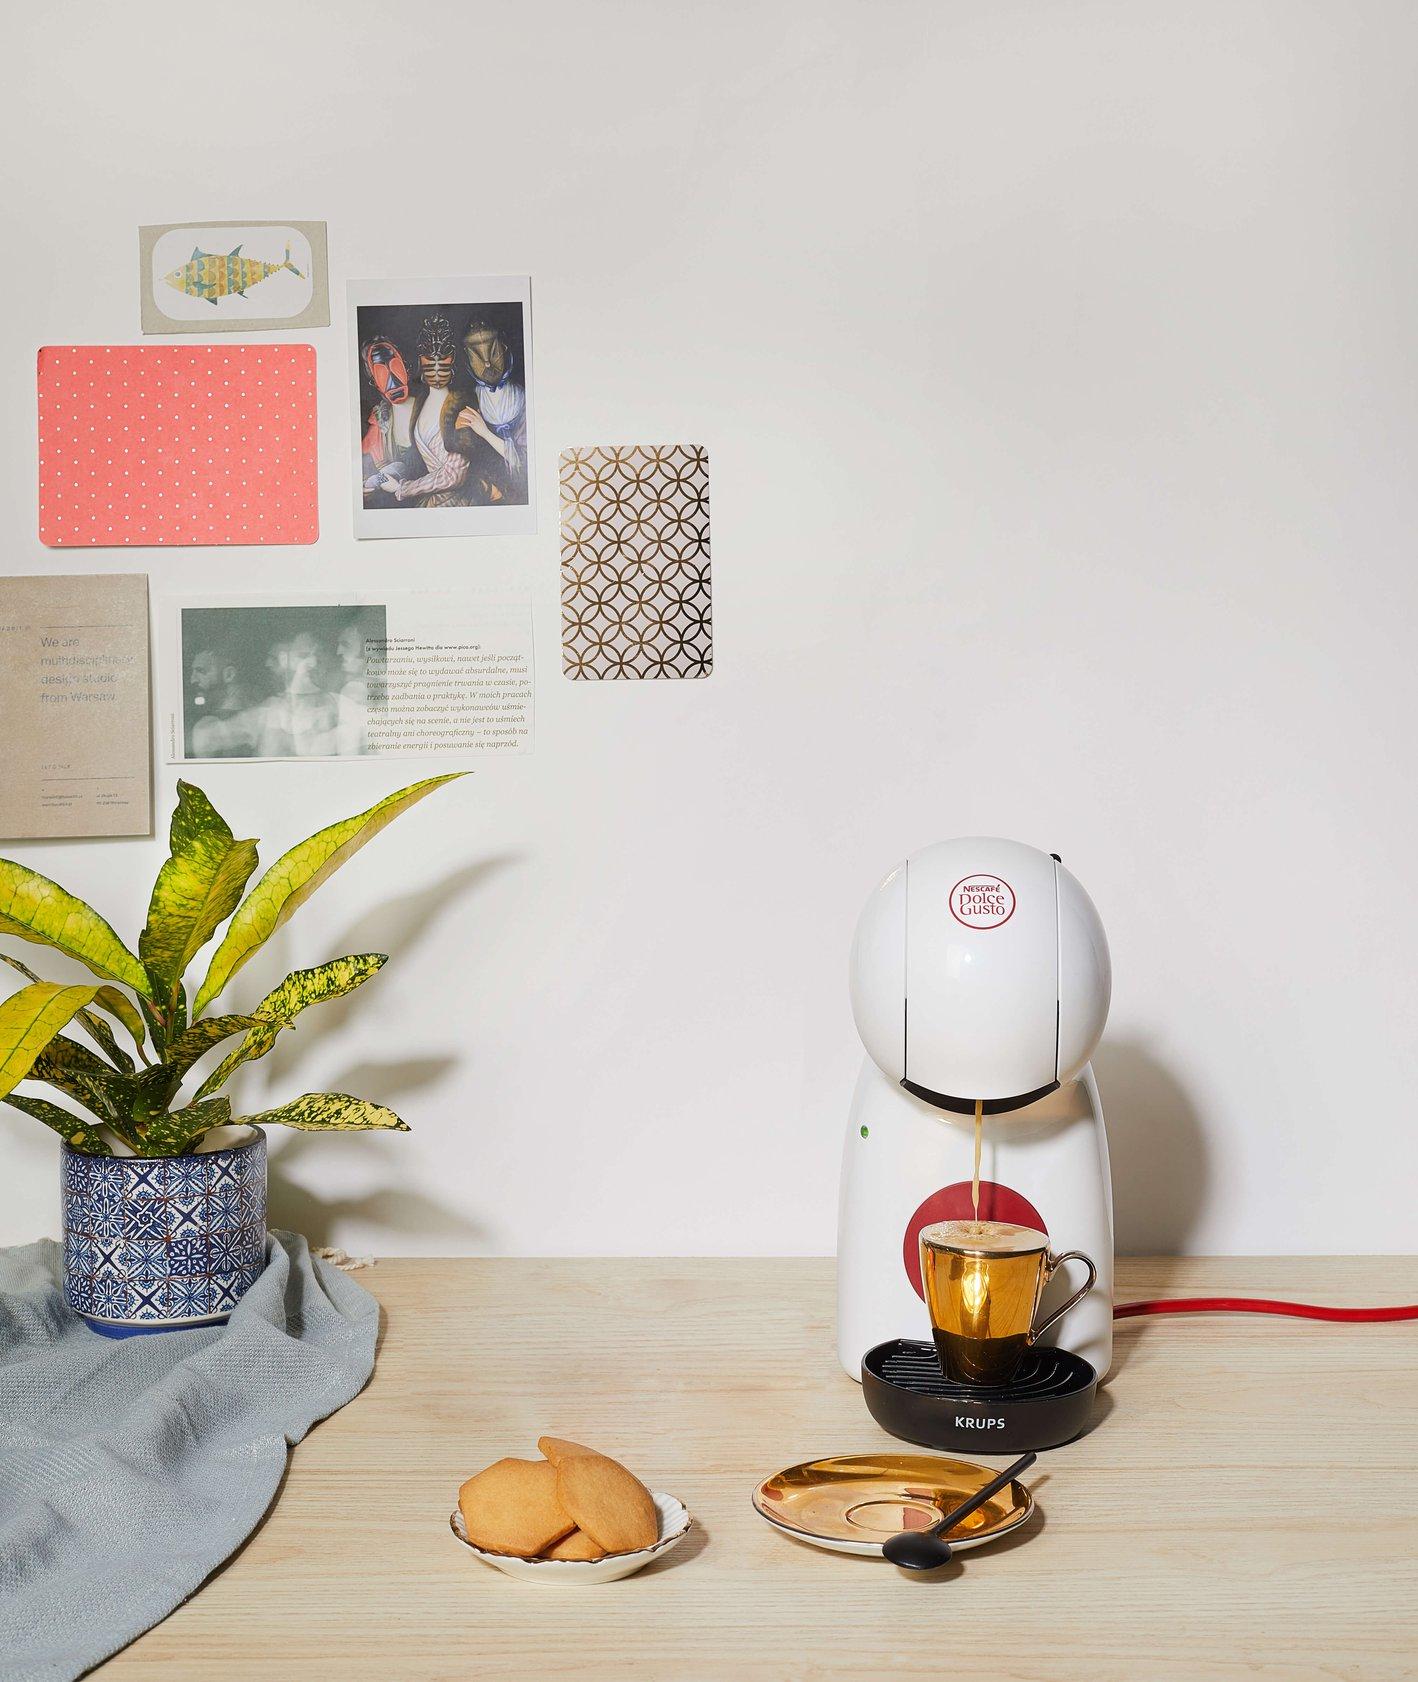 Mleczna kawa w szklance na spodku (fot. Lex Sirikiat / unsplash.com)